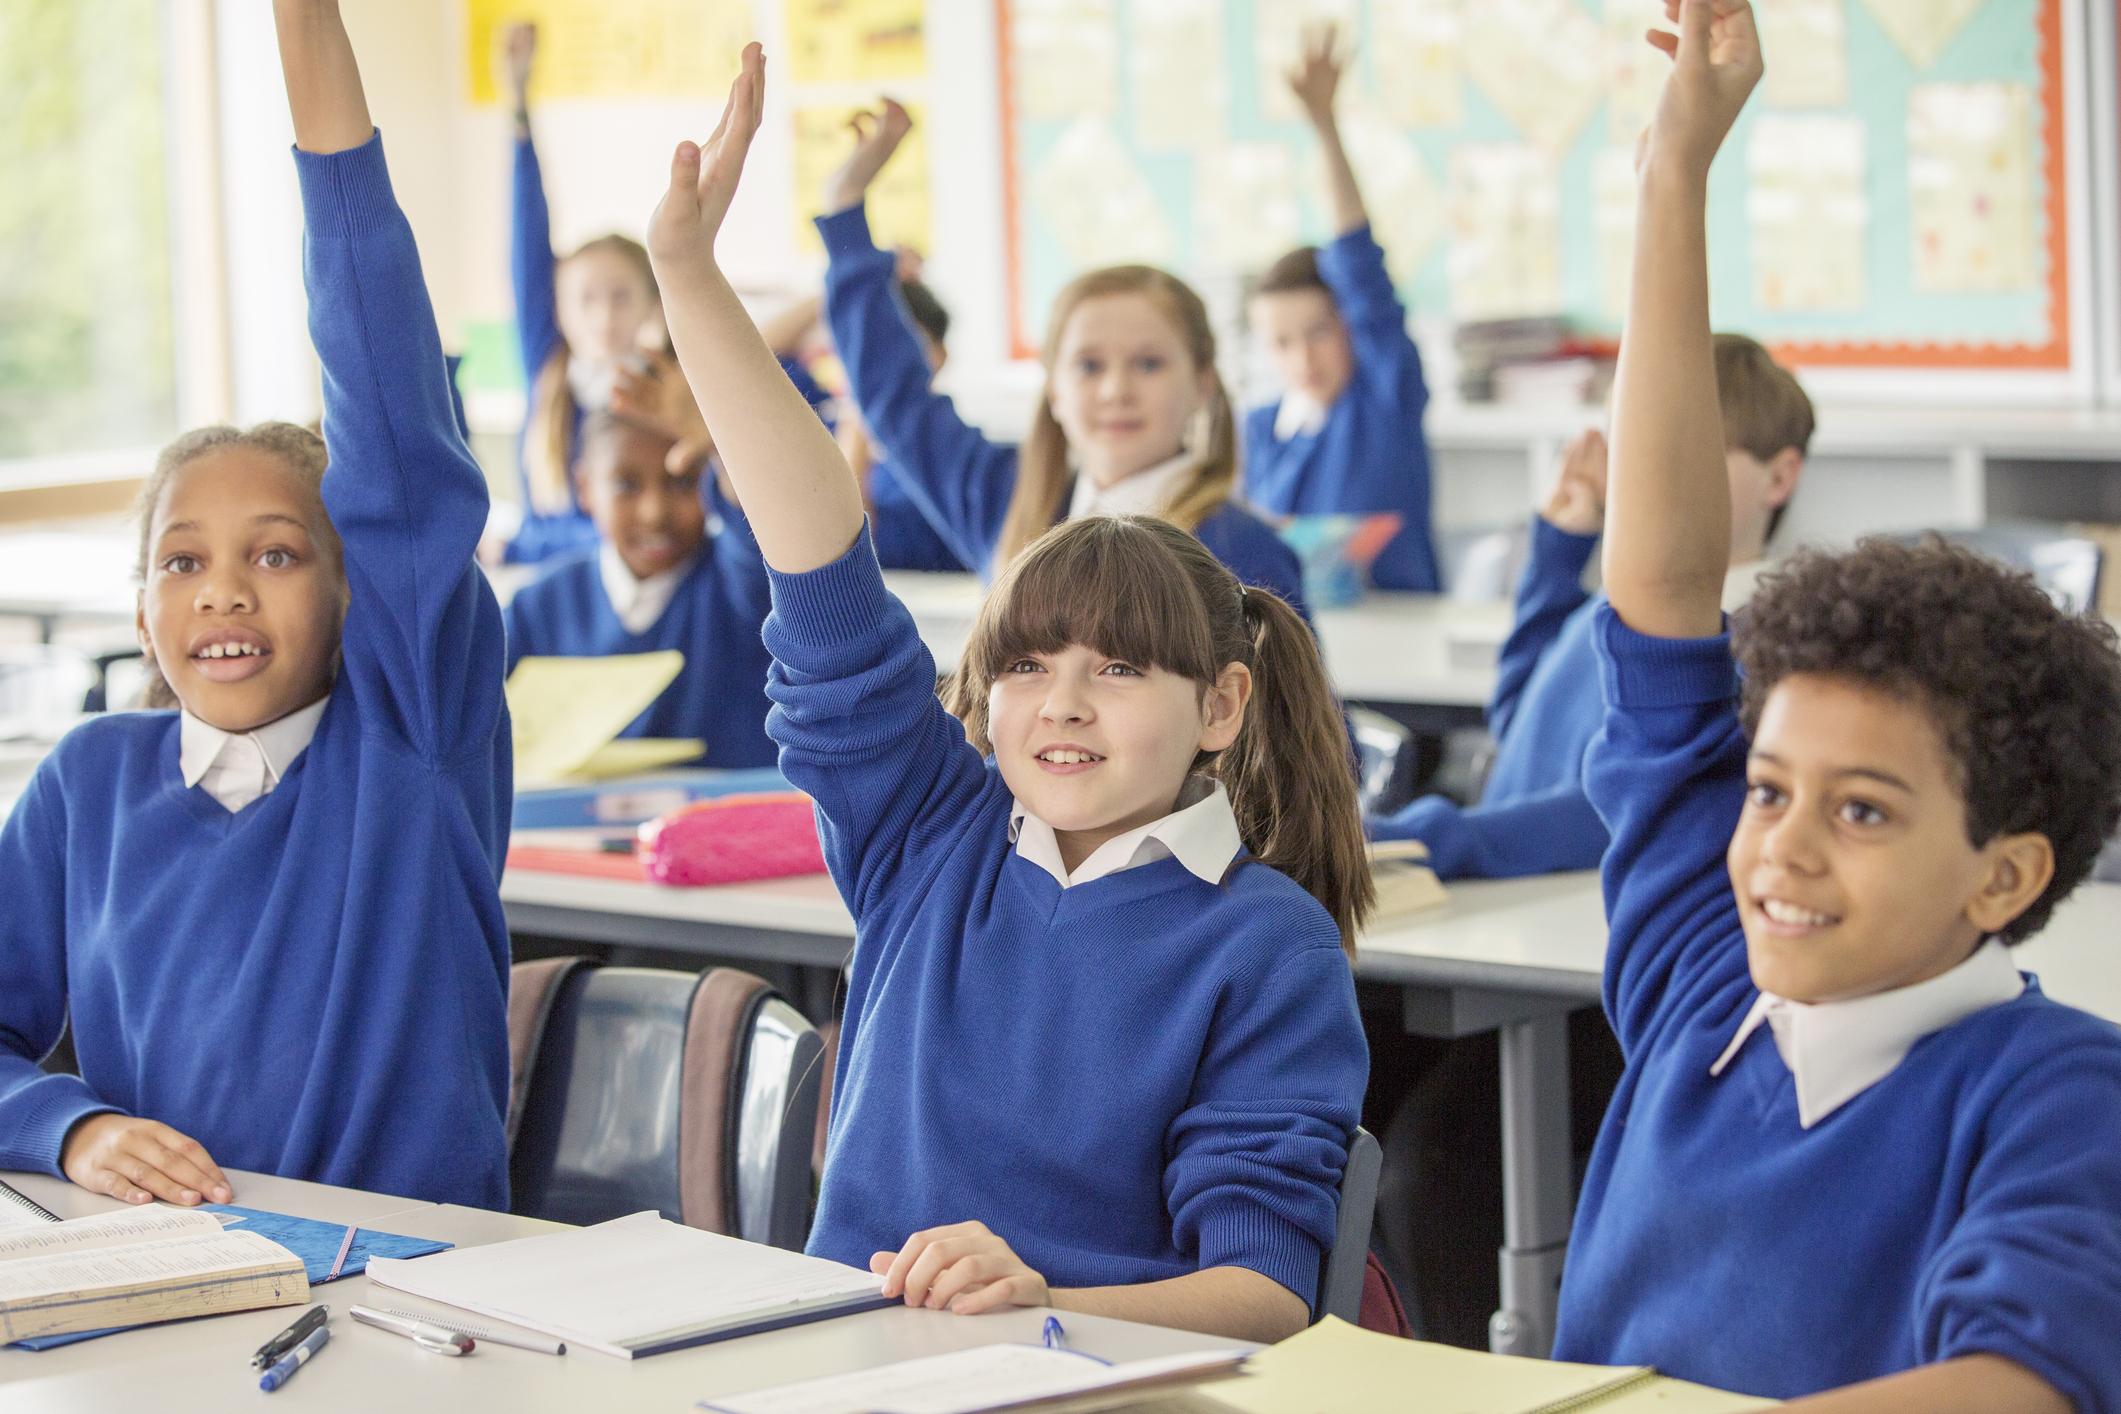 Classroom Activities for Multiple Intelligences | LoveToKnow